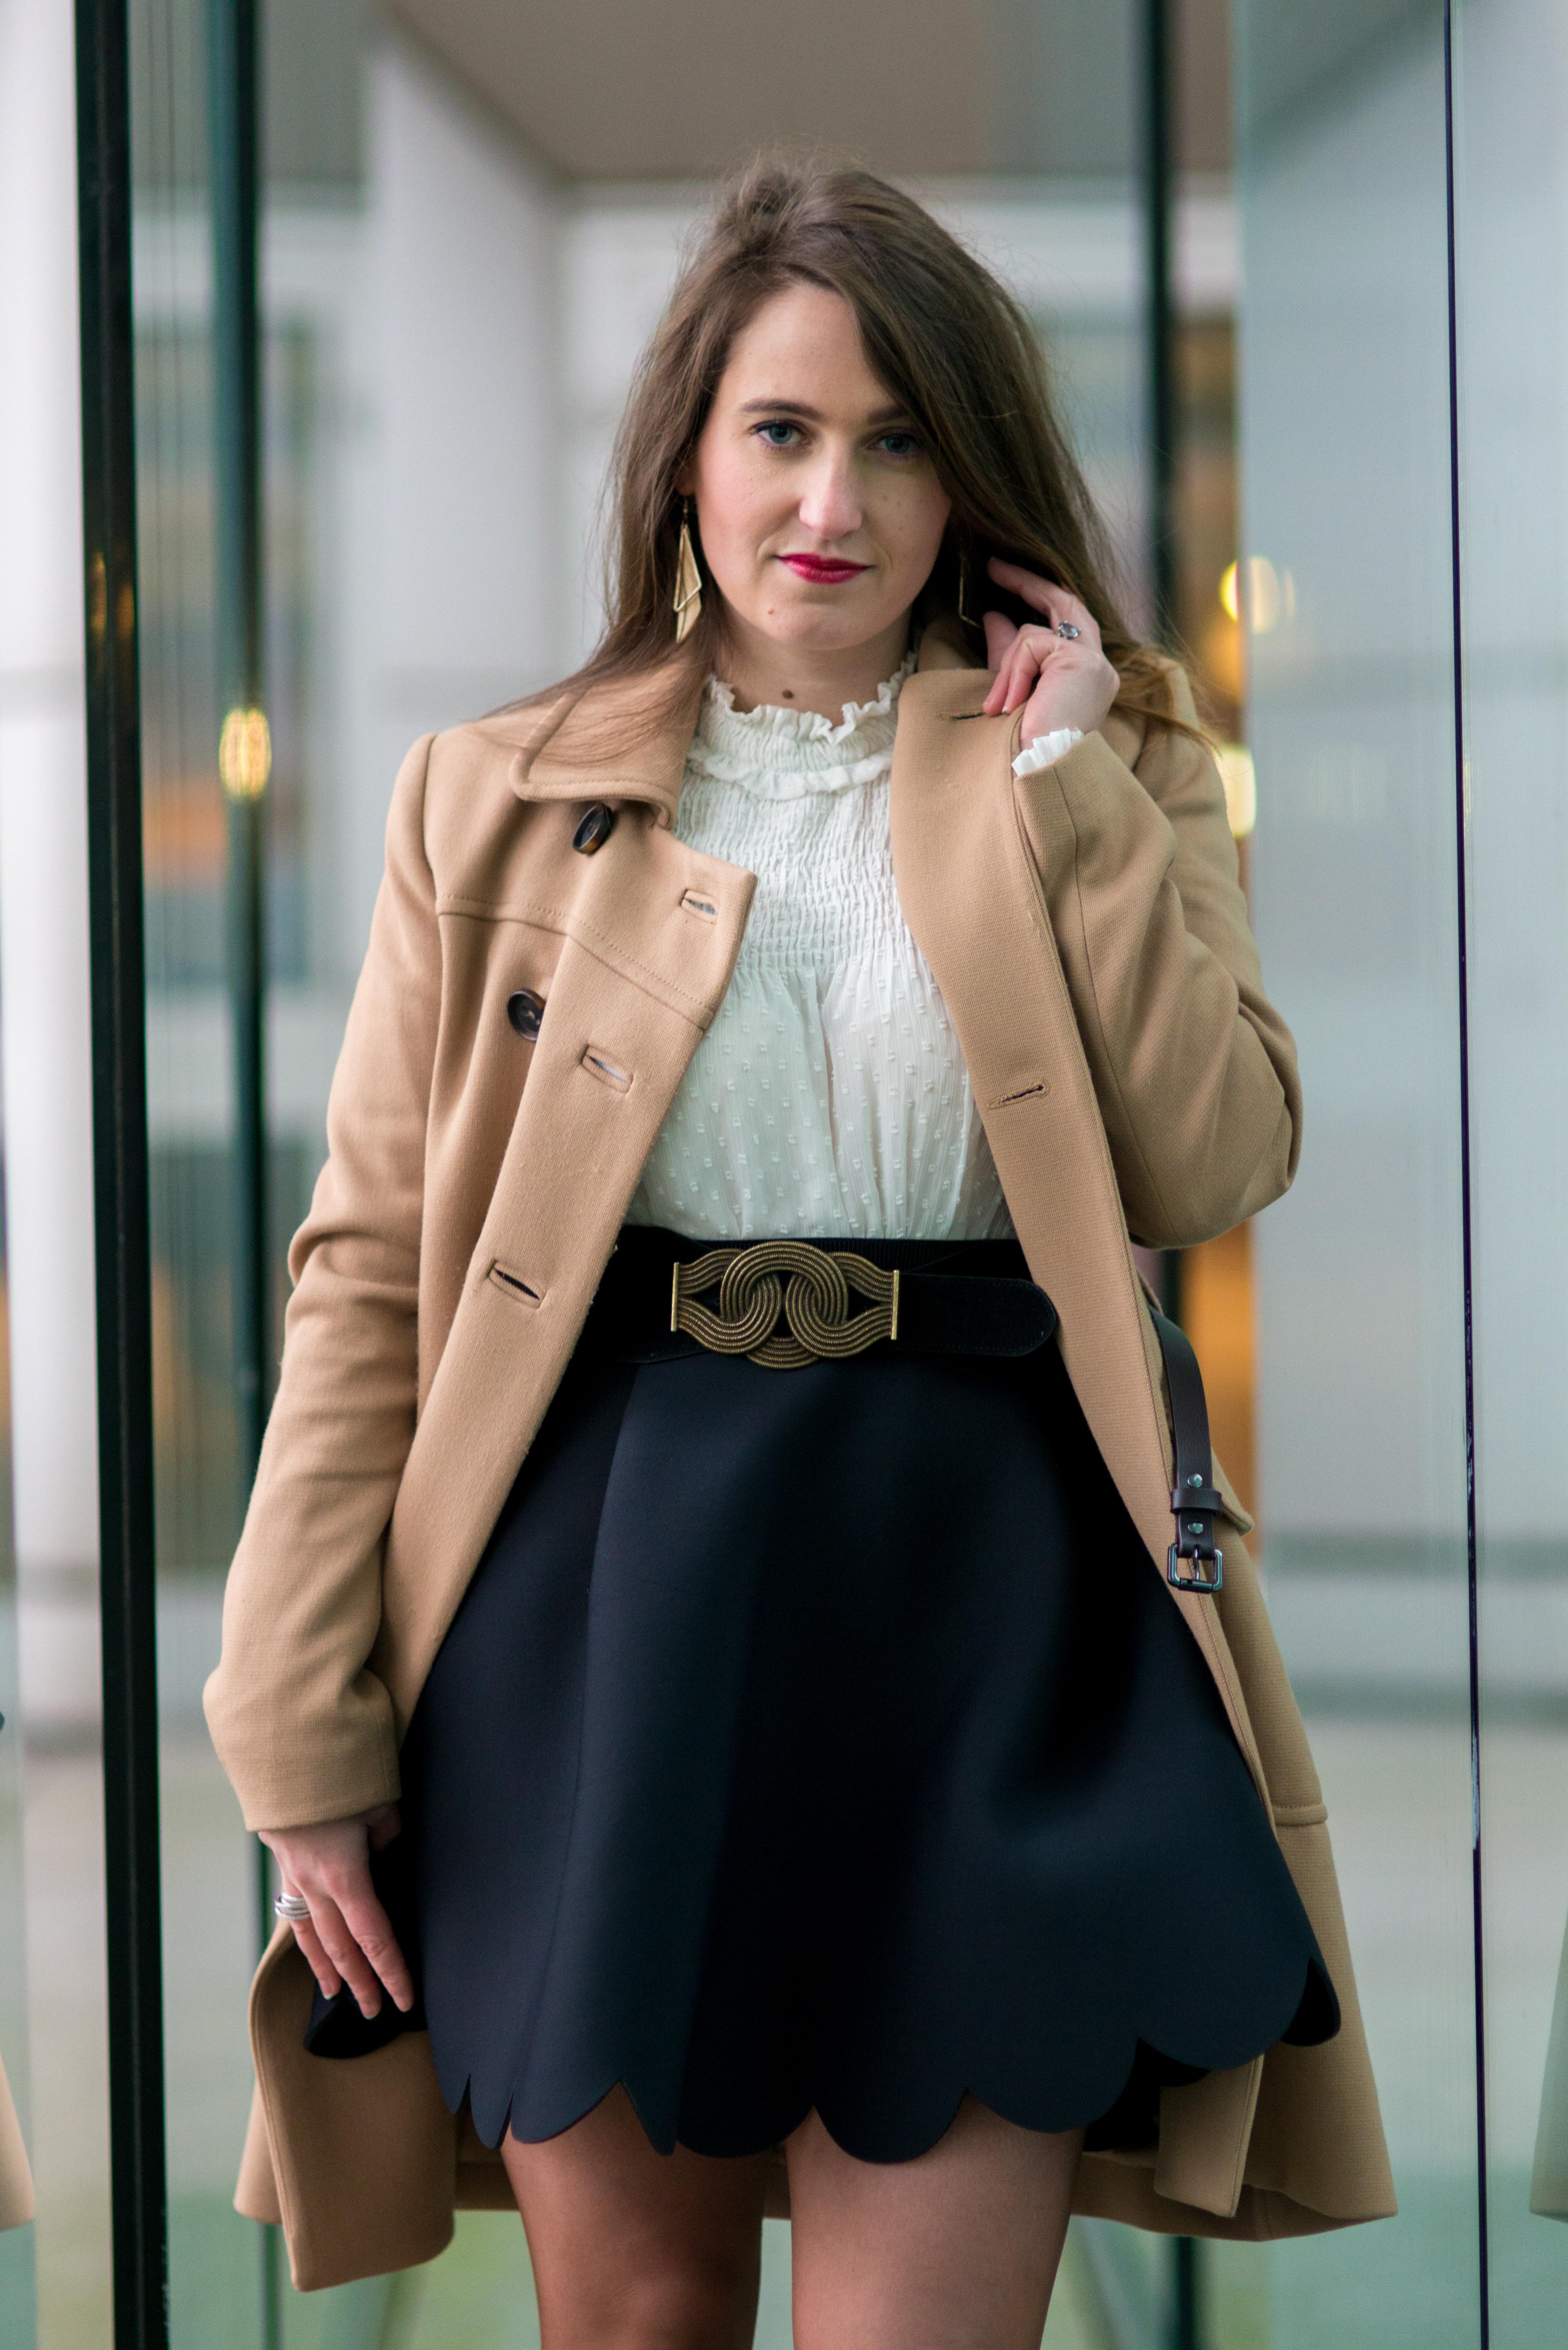 style-sophistique-modele-grandearche-ladefense-paris-fashionblogger-influencer-blouse-zara-seralynepointcom-ump_6723